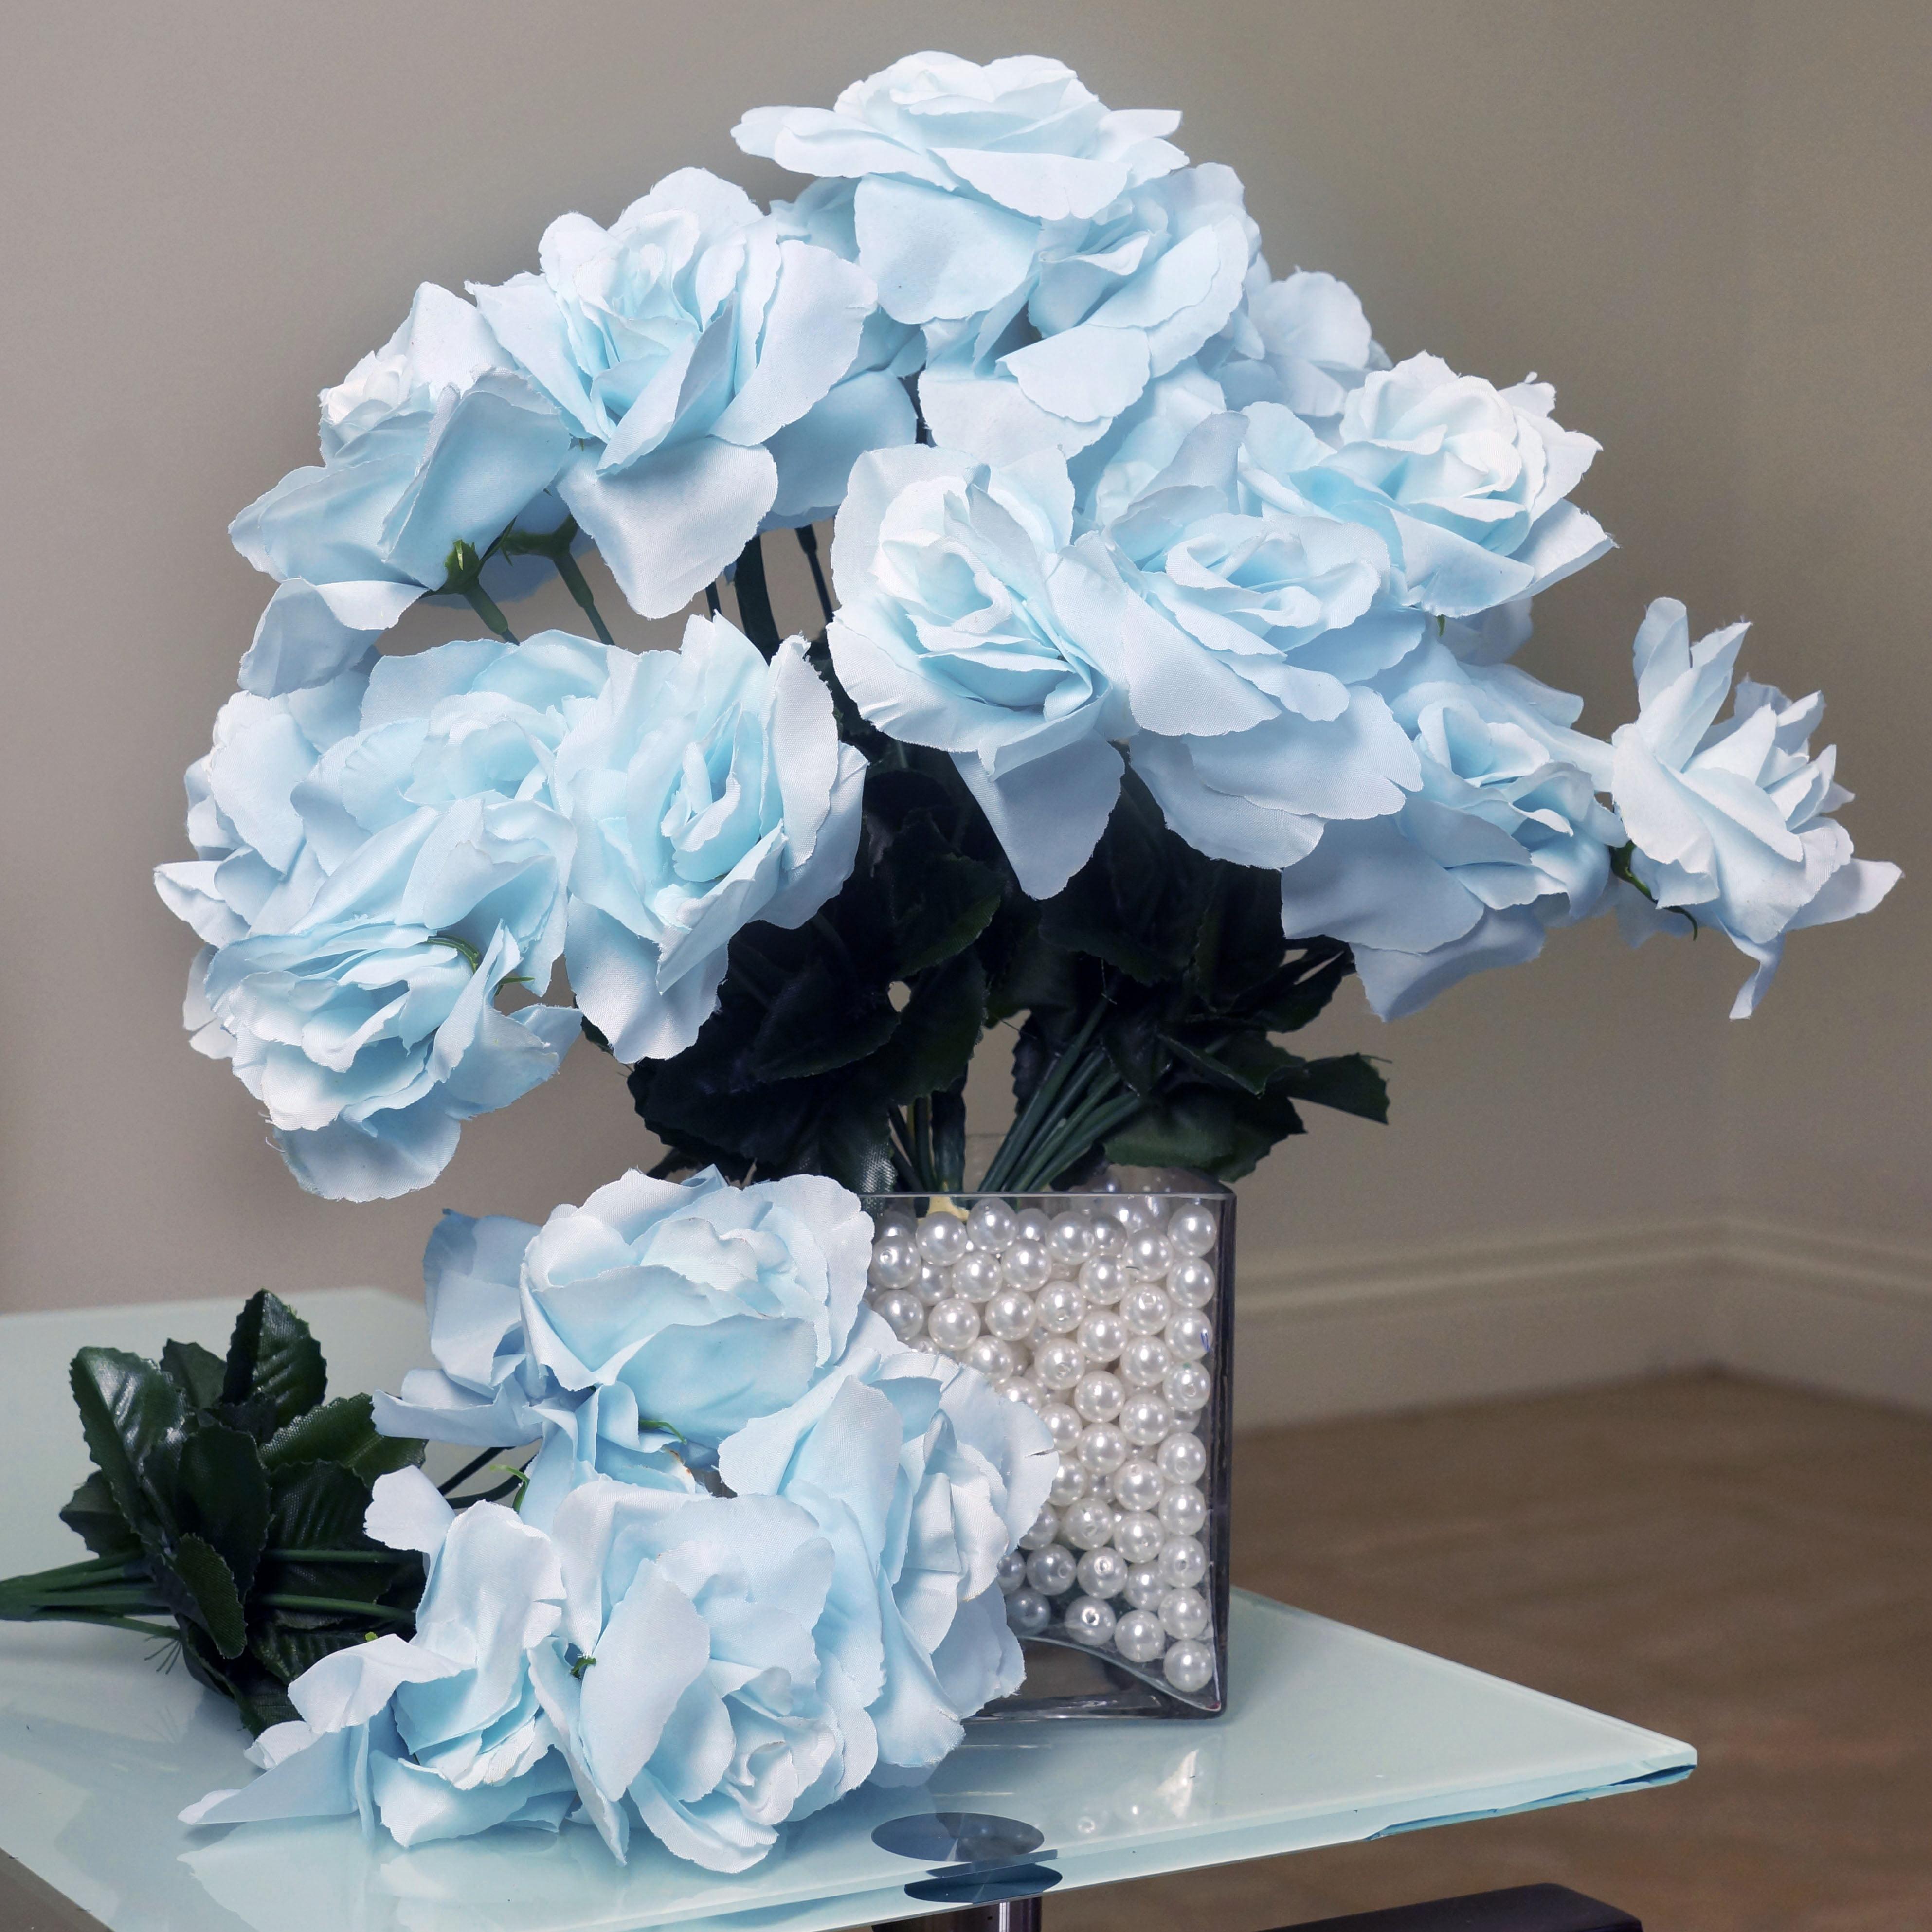 Balsacircle 84 Silk Open Roses Bouquets Diy Home Wedding Party